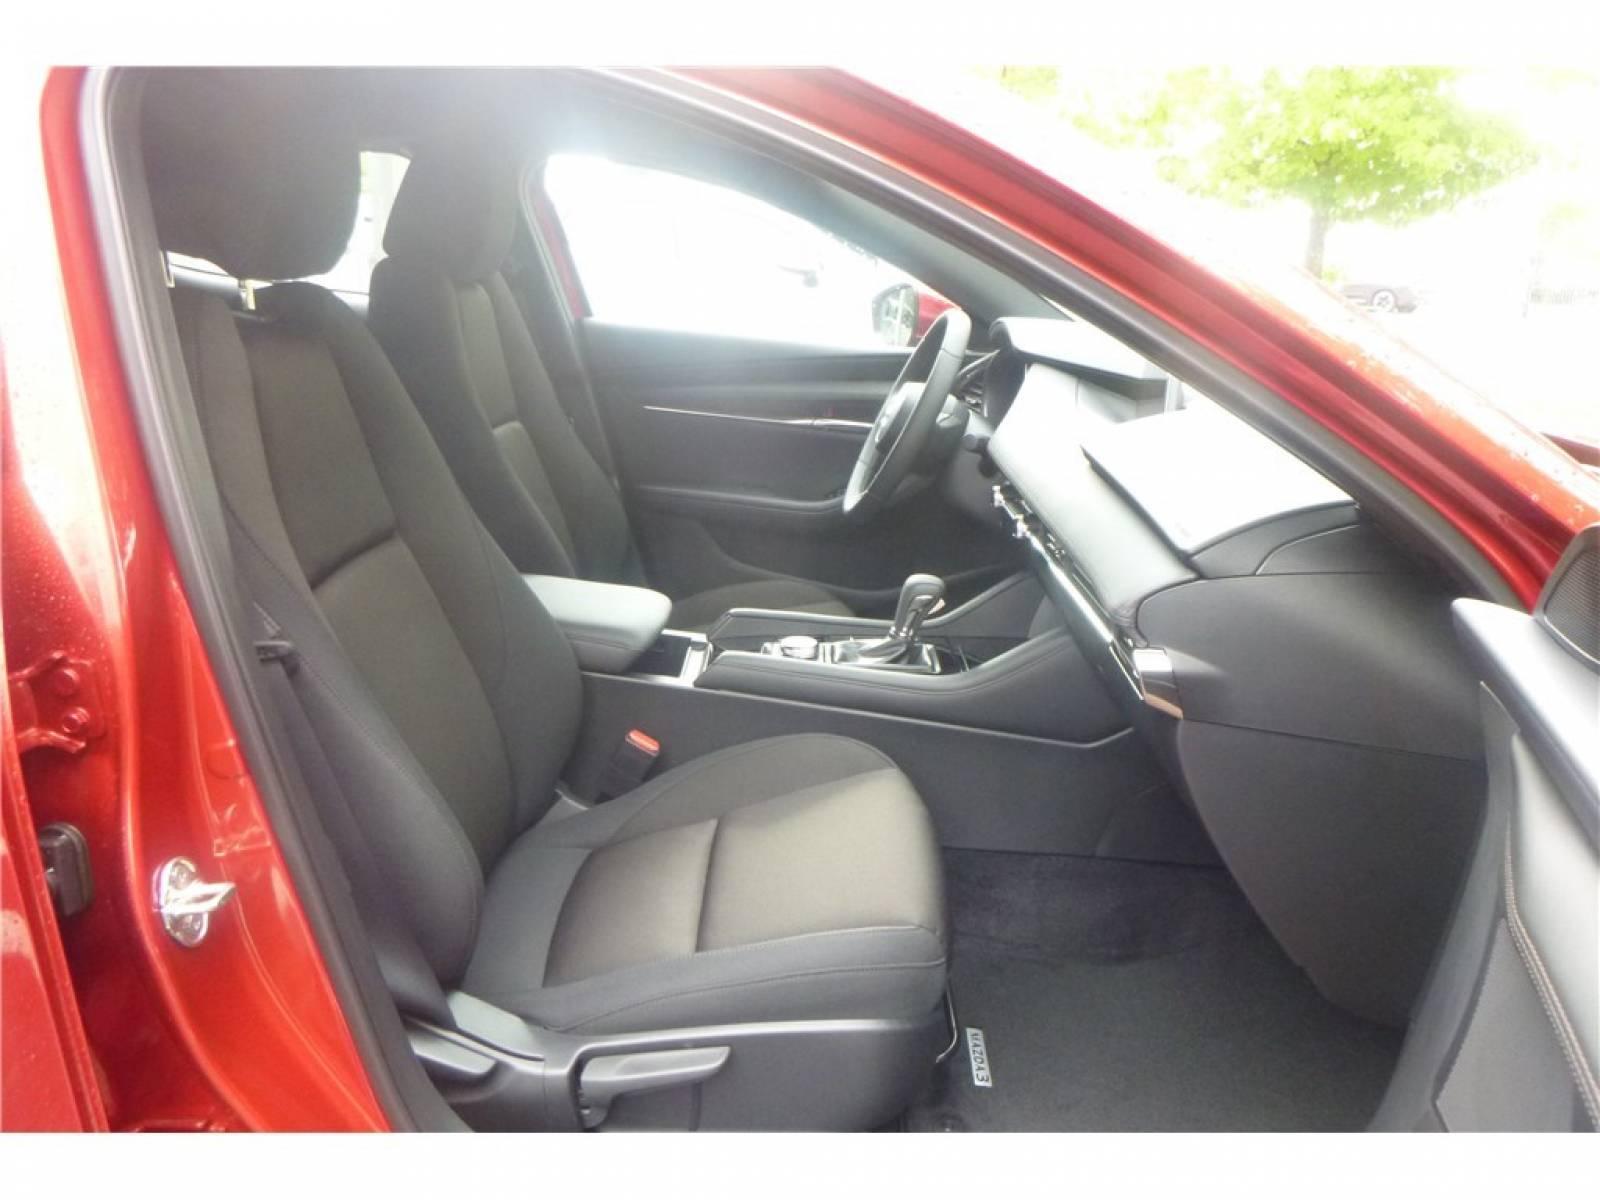 MAZDA Mazda3 5 portes 2.0L e-SKYACTIV-G M Hybrid 122 ch BVA6 - véhicule d'occasion - Groupe Guillet - Chalon Automobiles - 71100 - Chalon-sur-Saône - 27